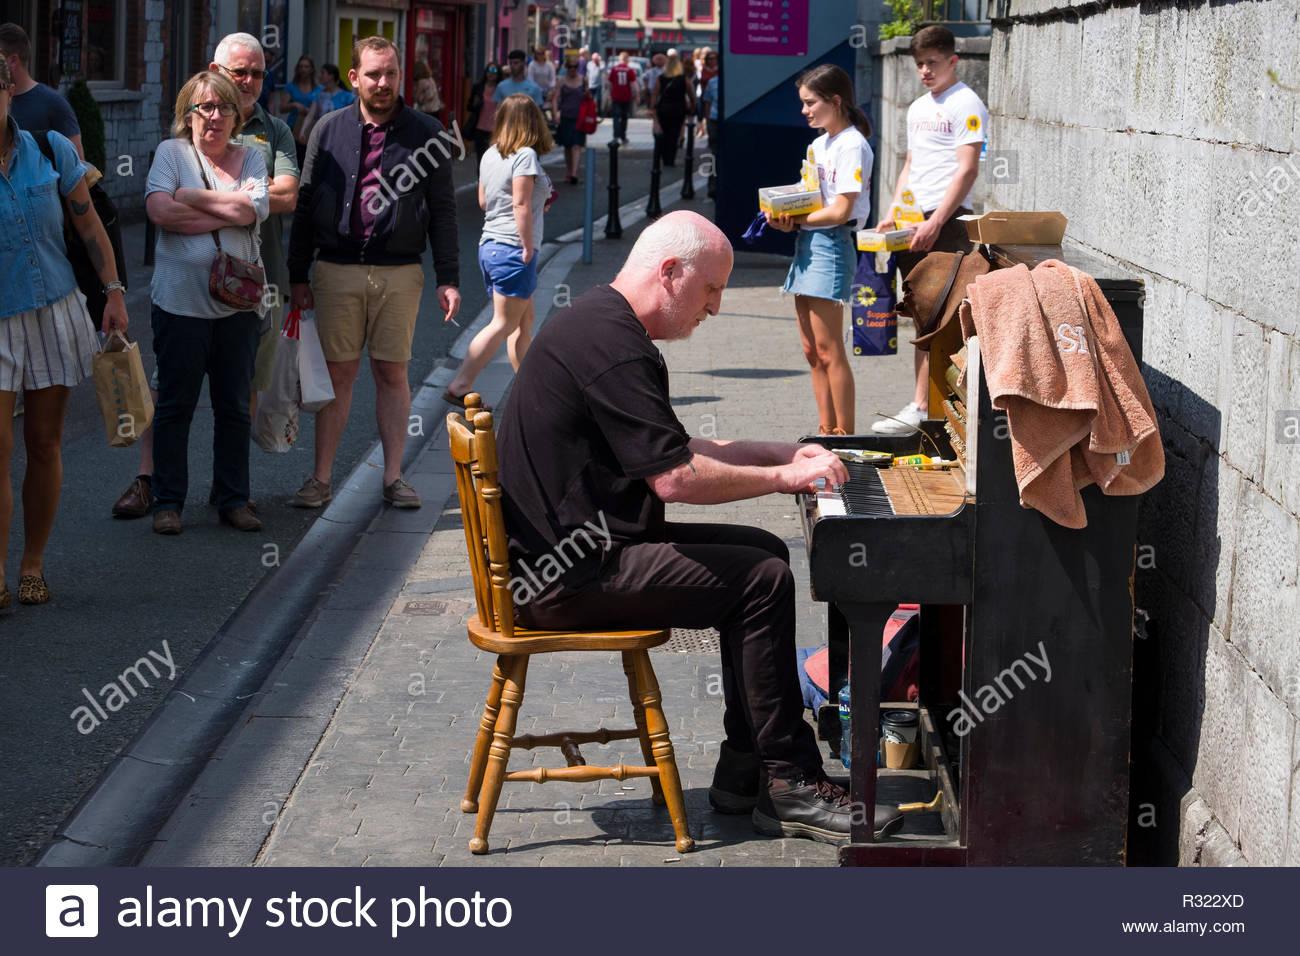 People watching man playing an upright piano outside on sidewalk, Paul Street, Centre, Cork, County Cork, Munster, Ireland Stock Photo